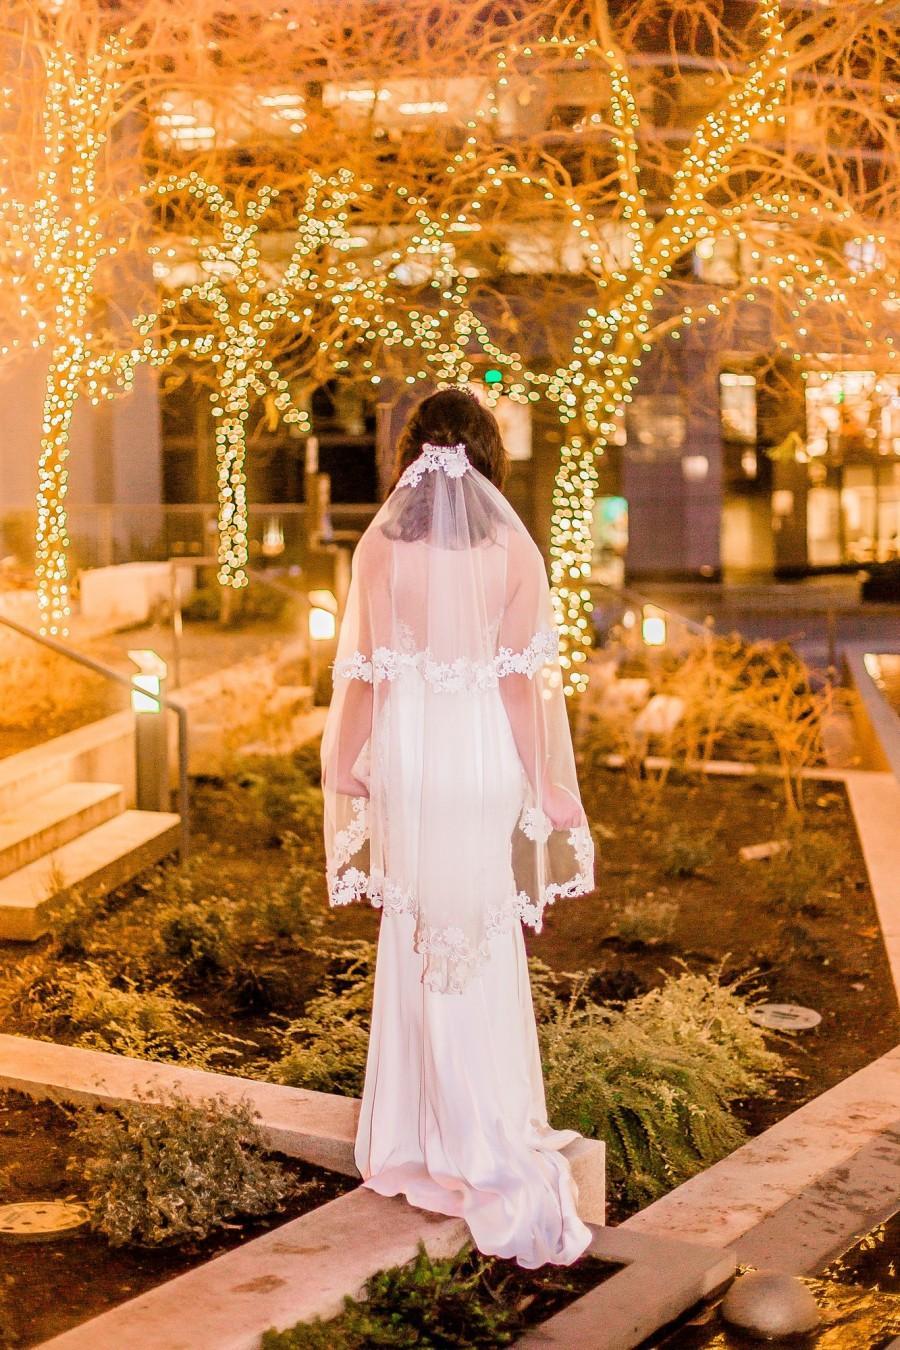 Wedding - Fingertip Length Two-Tier Veil #82, Fingertip Length veil, Fingertip Veils, Wedding Veil with Blusher ,Bridal Lace Veil, Custom Wedding Veil